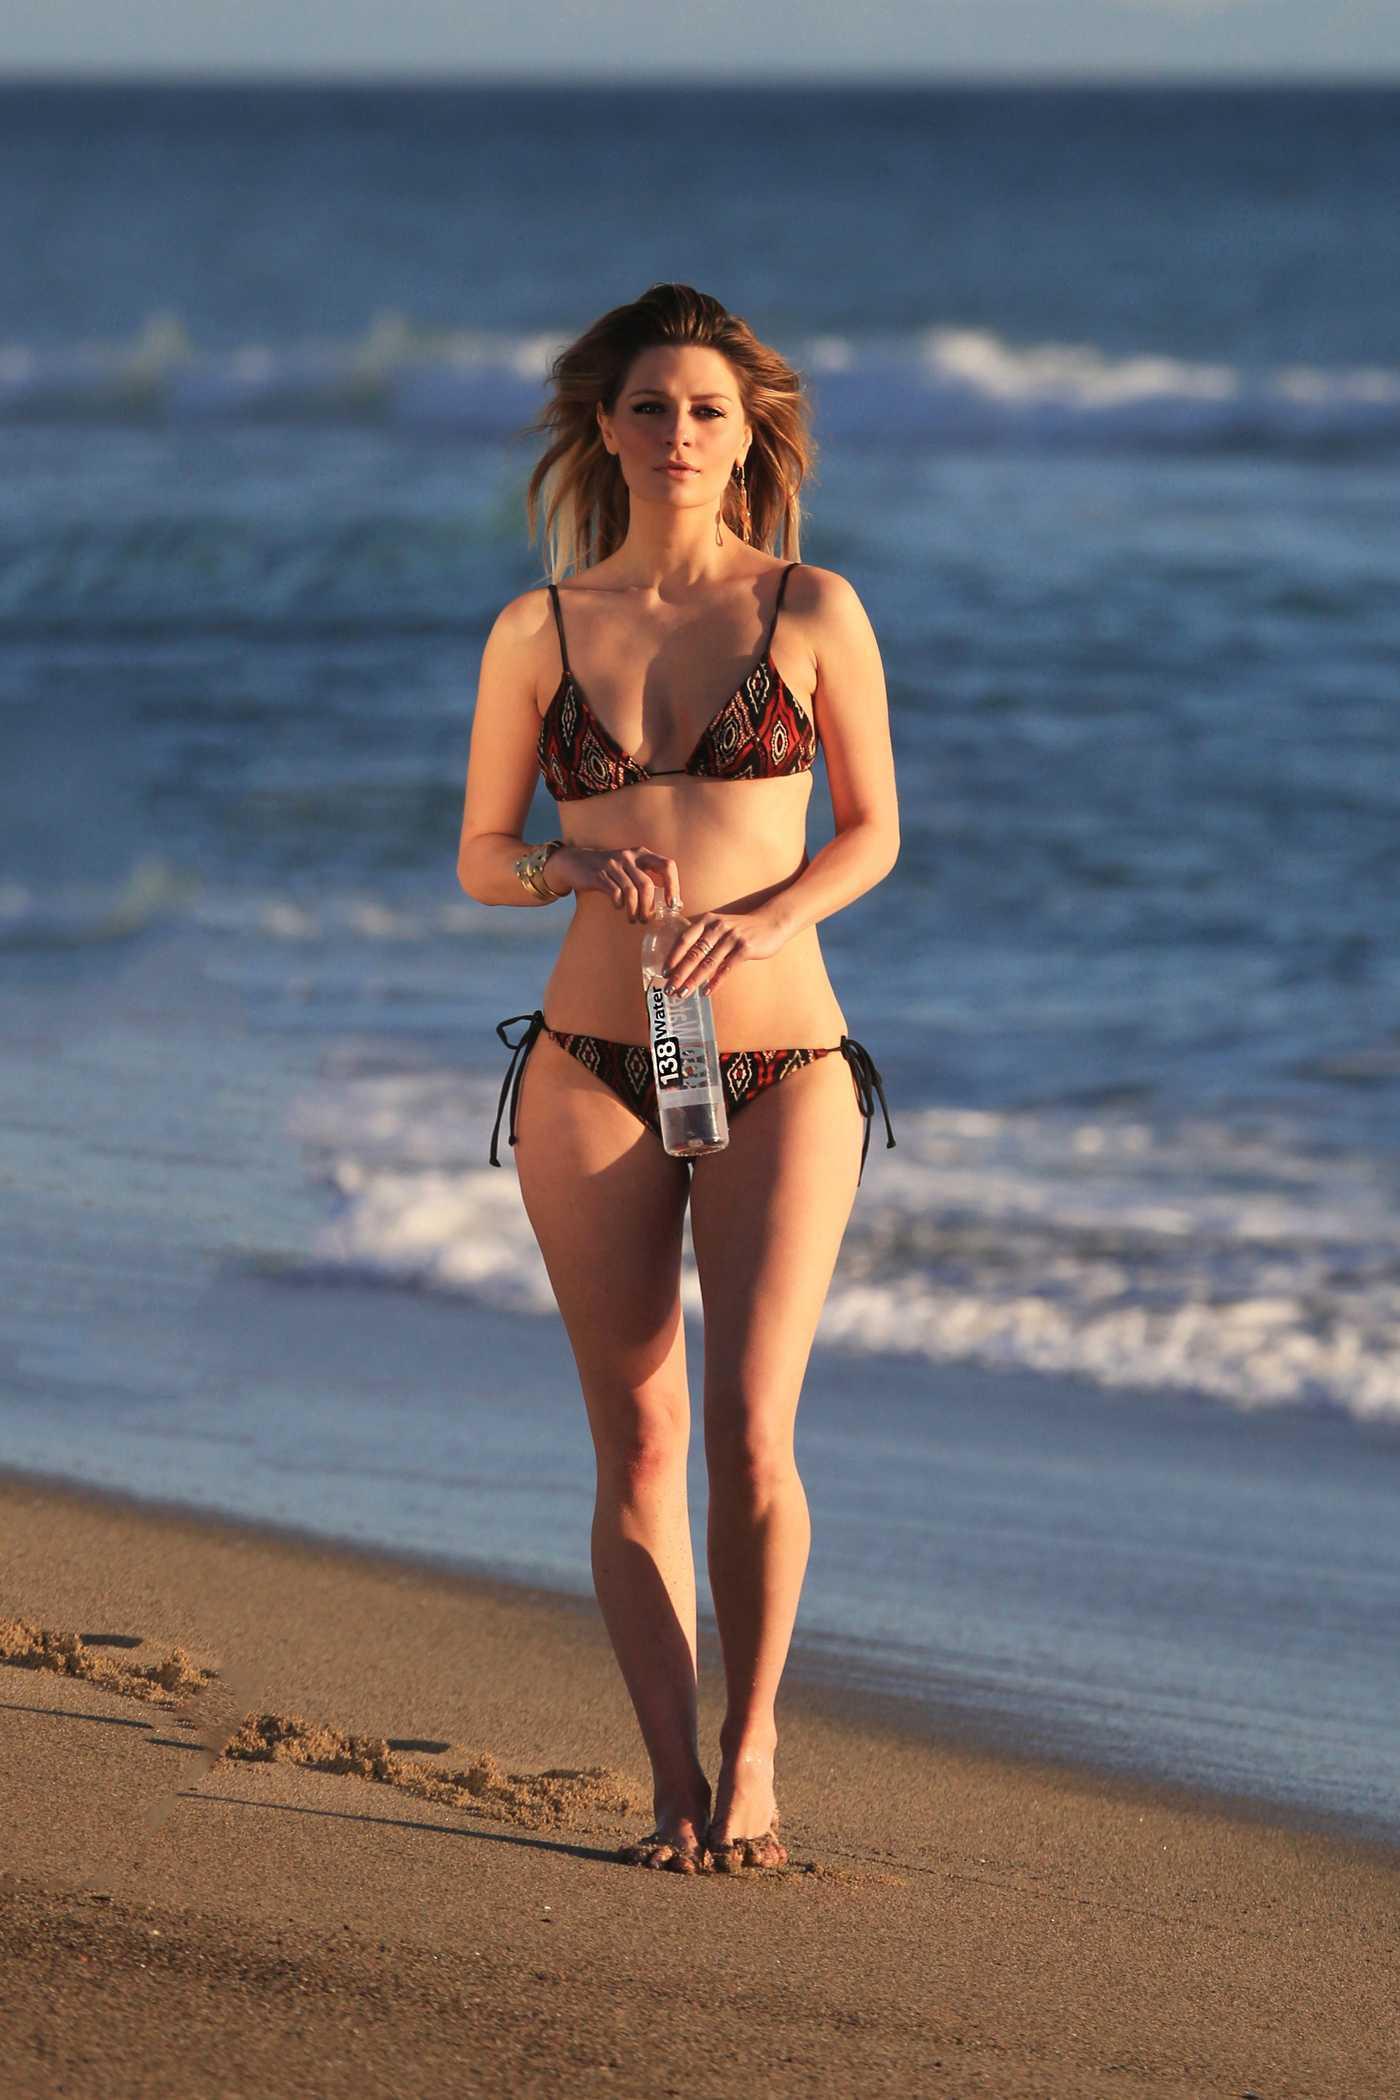 Mischa Barton Does a 138 Water Bikini Photoshoot in Huntington Beach 03/01/2017